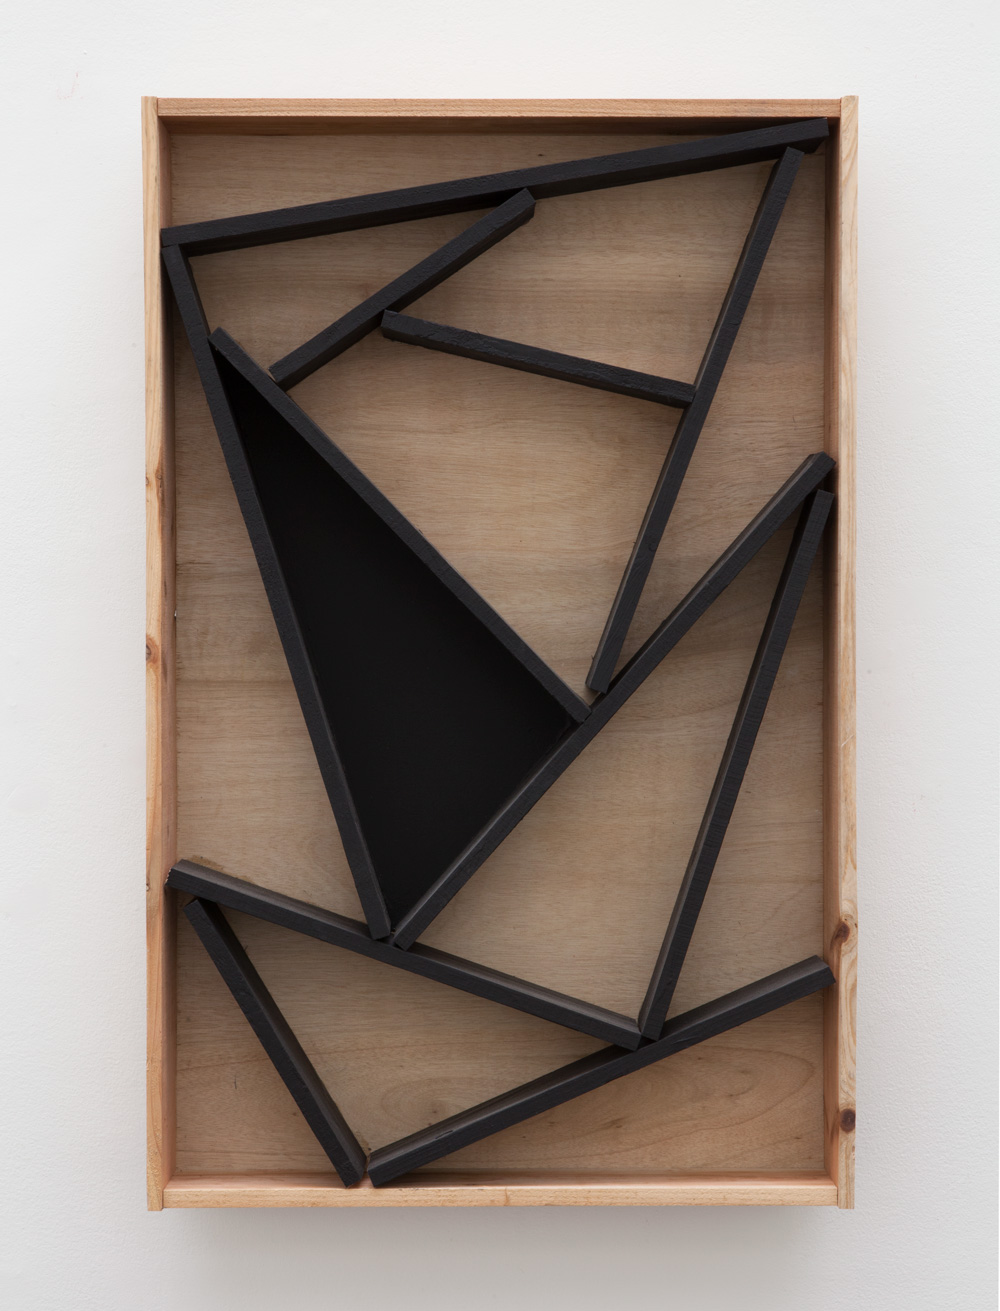 Demarcated Existence , 2016 境在 (Kyōzai) Wood, paint 35 1/2 x 22 3/4 x 5 1/2 inches  90.2 x 57.8 x 14 cm